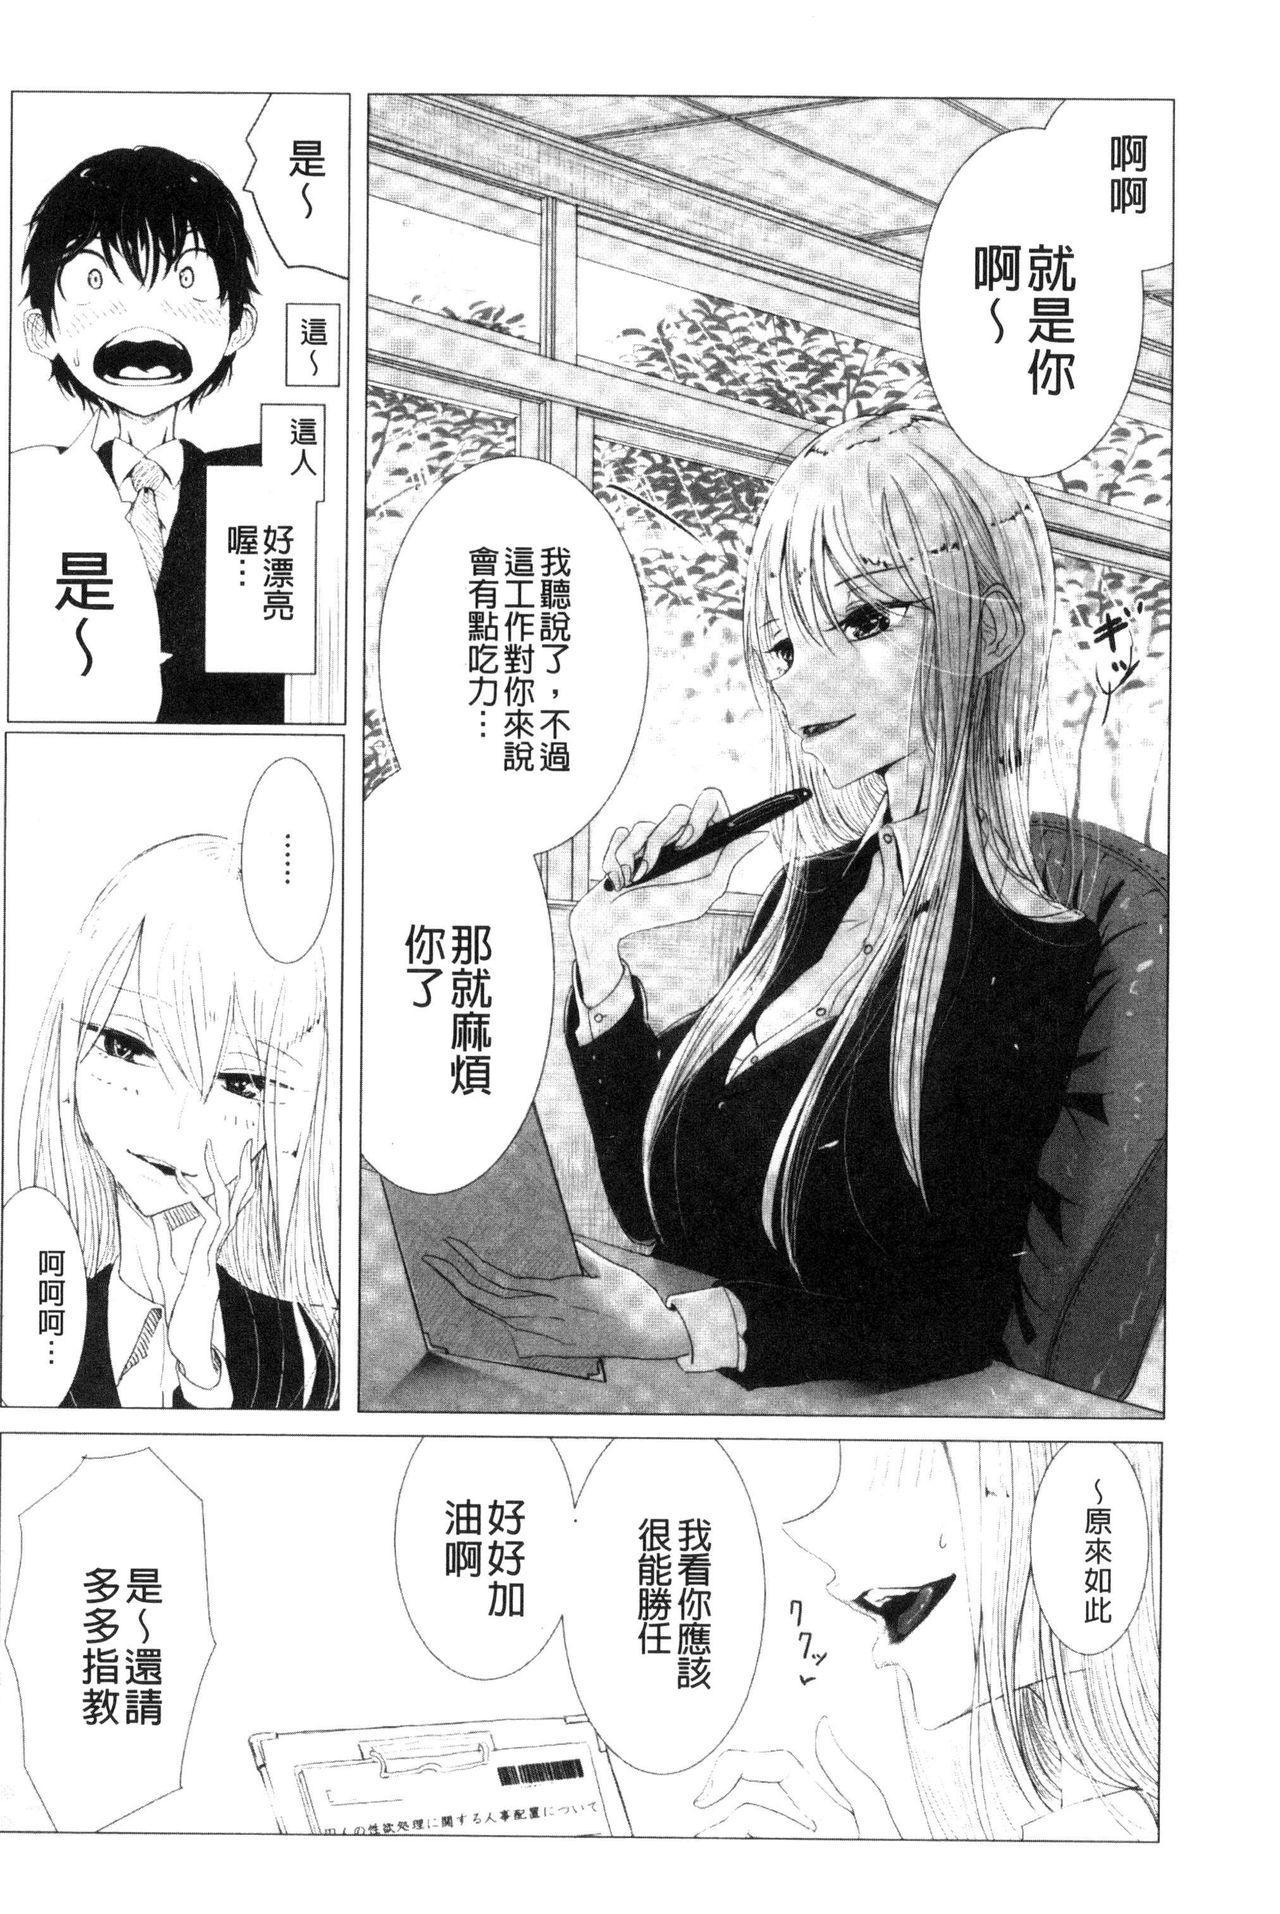 [Dhibi] Sono Yubisaki de Korogashite - Please Caress it at the Finger-tip. [Chinese] 157